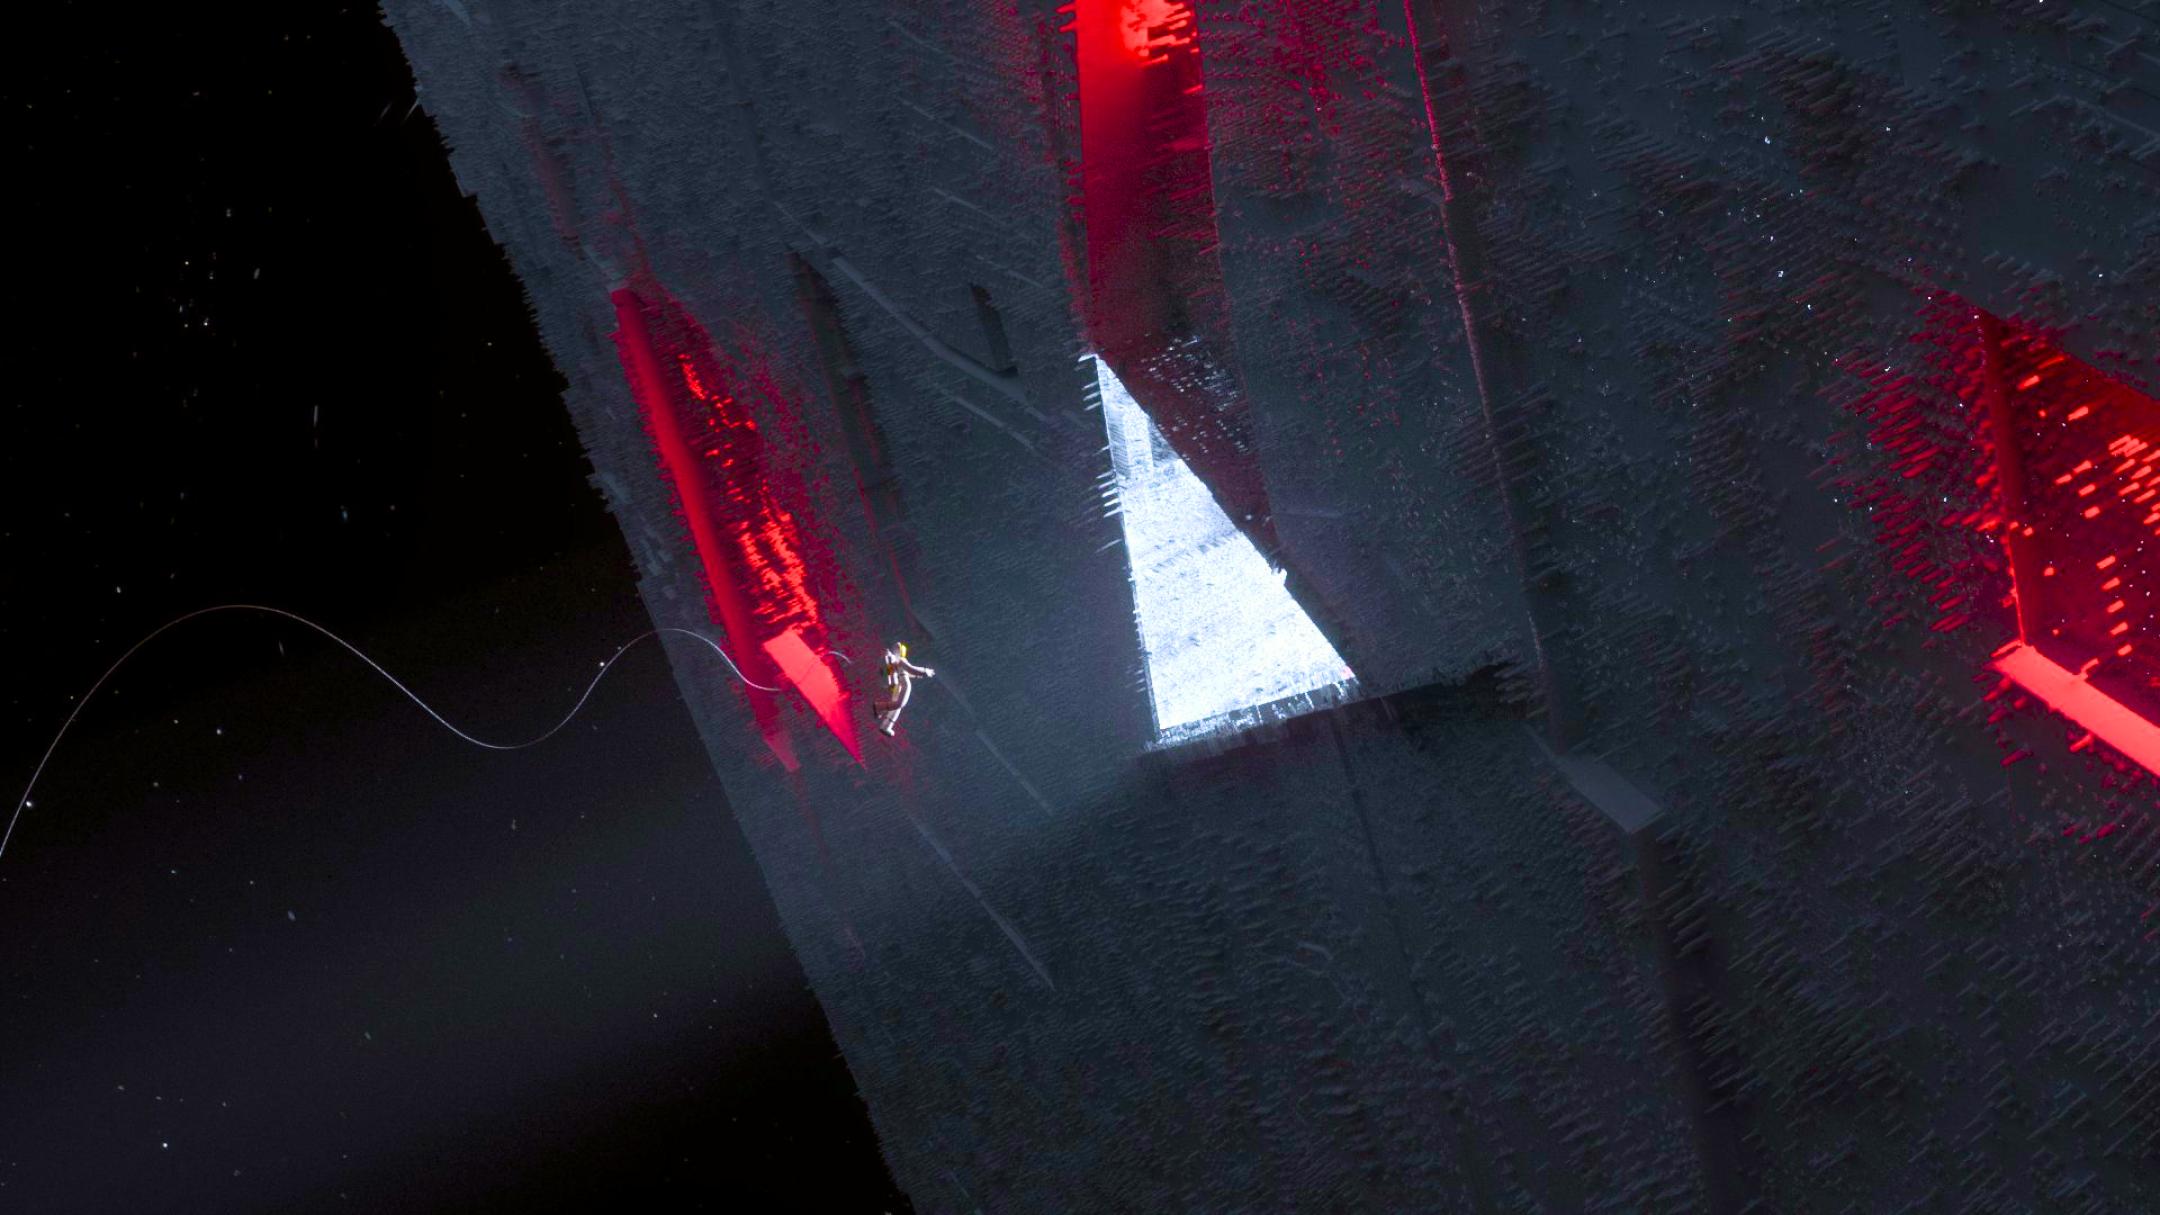 Artifact - ICARUS - 2021